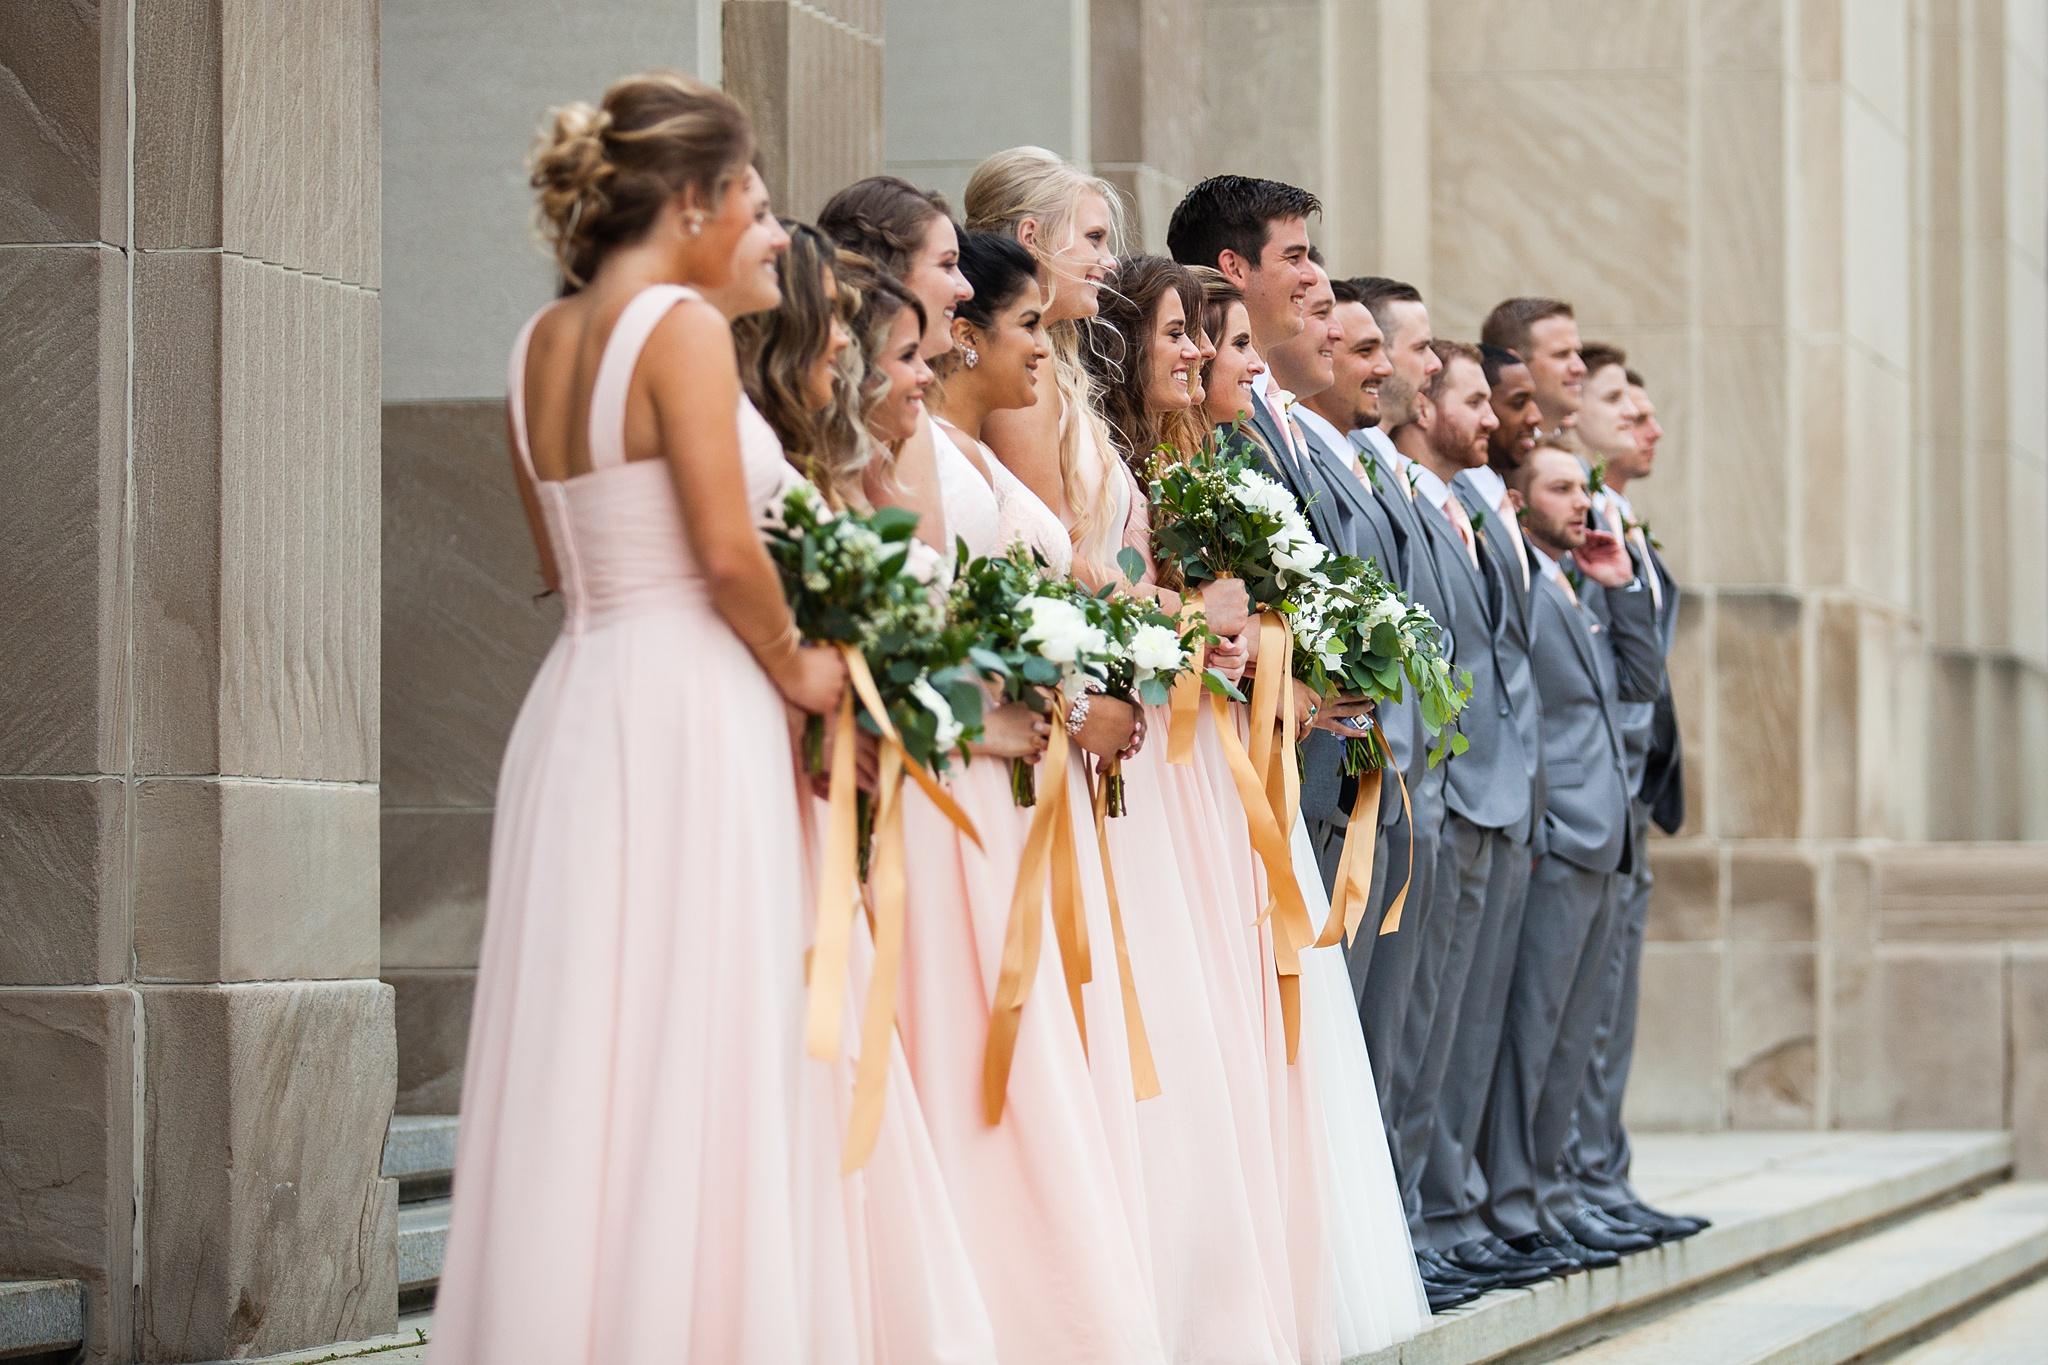 Meghan_Drew_Grand_Rapids_Cheney_place_Wedding037.JPG